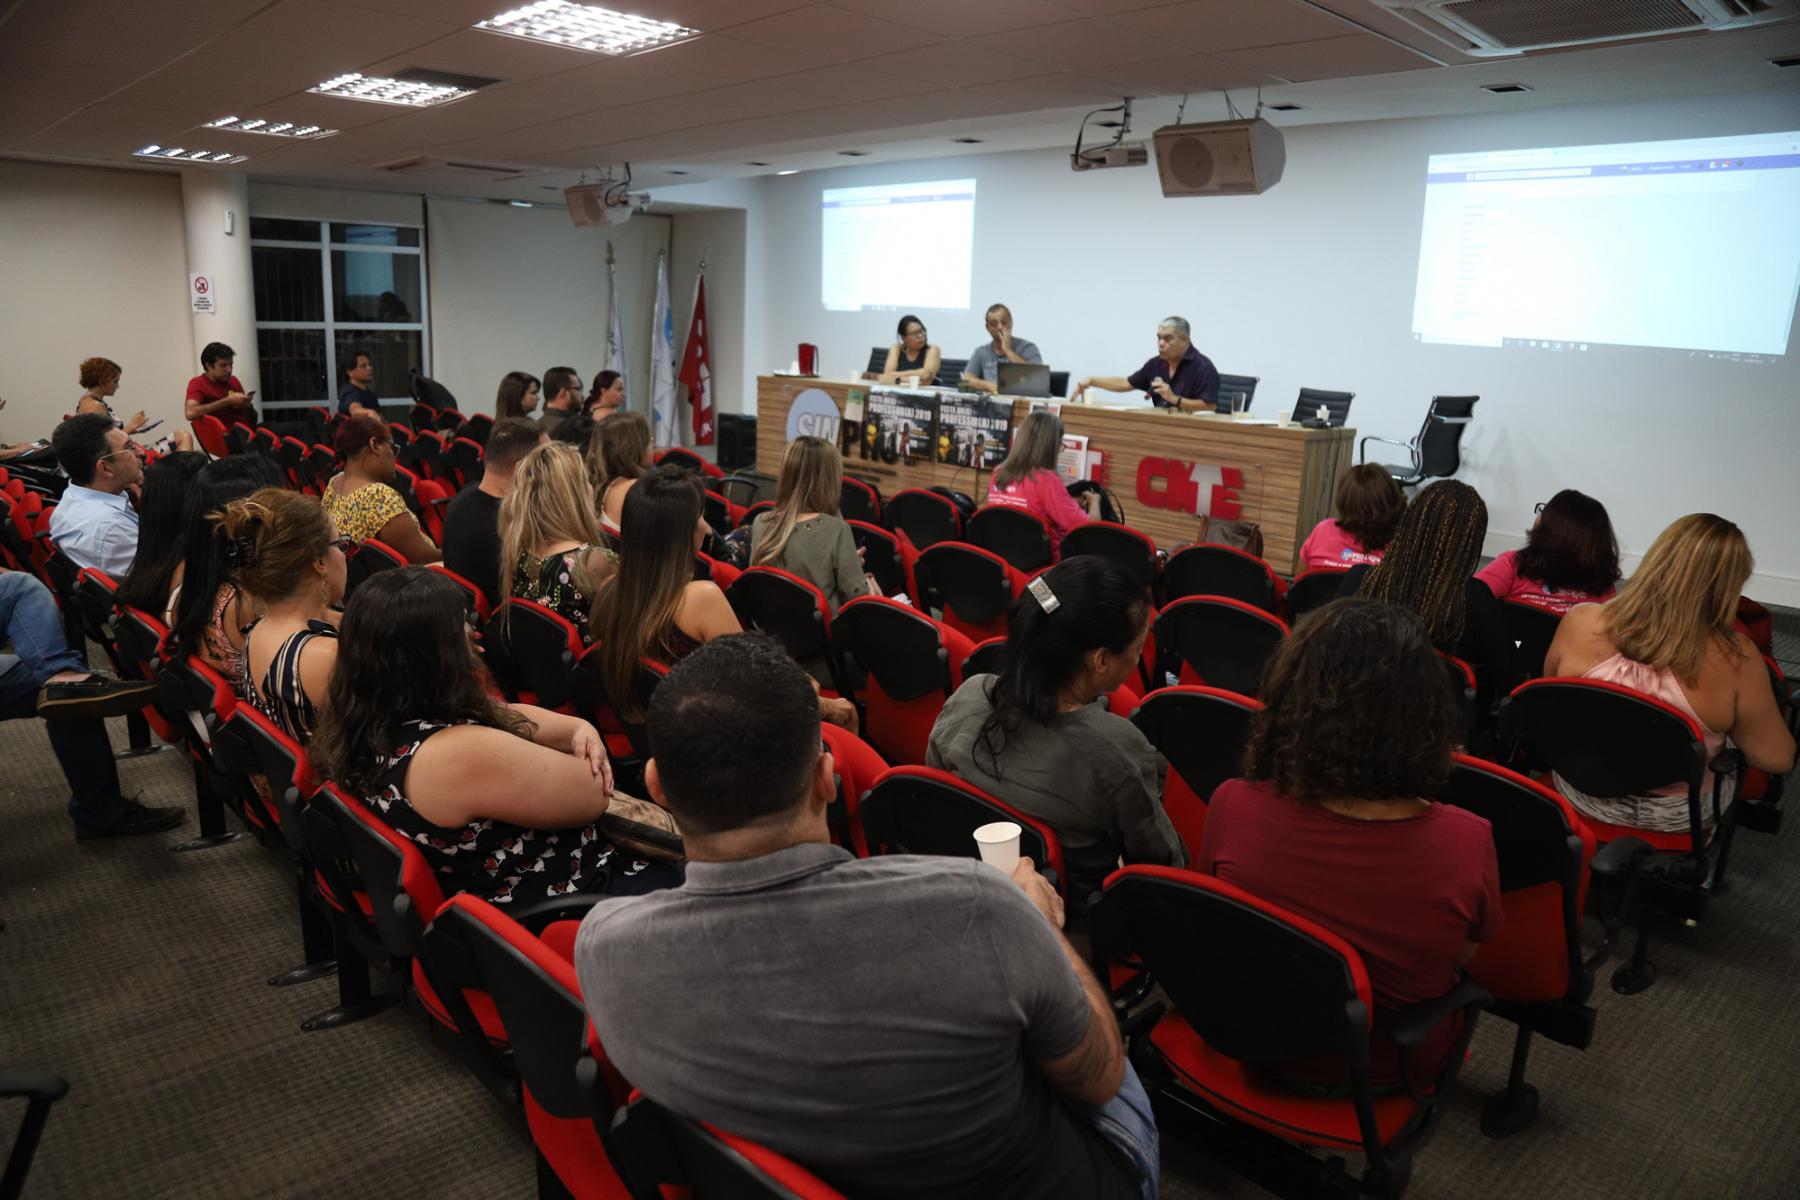 2019.09.19-Plenaria-sobre-Gestao-Democratica_fotos-ECOM-12